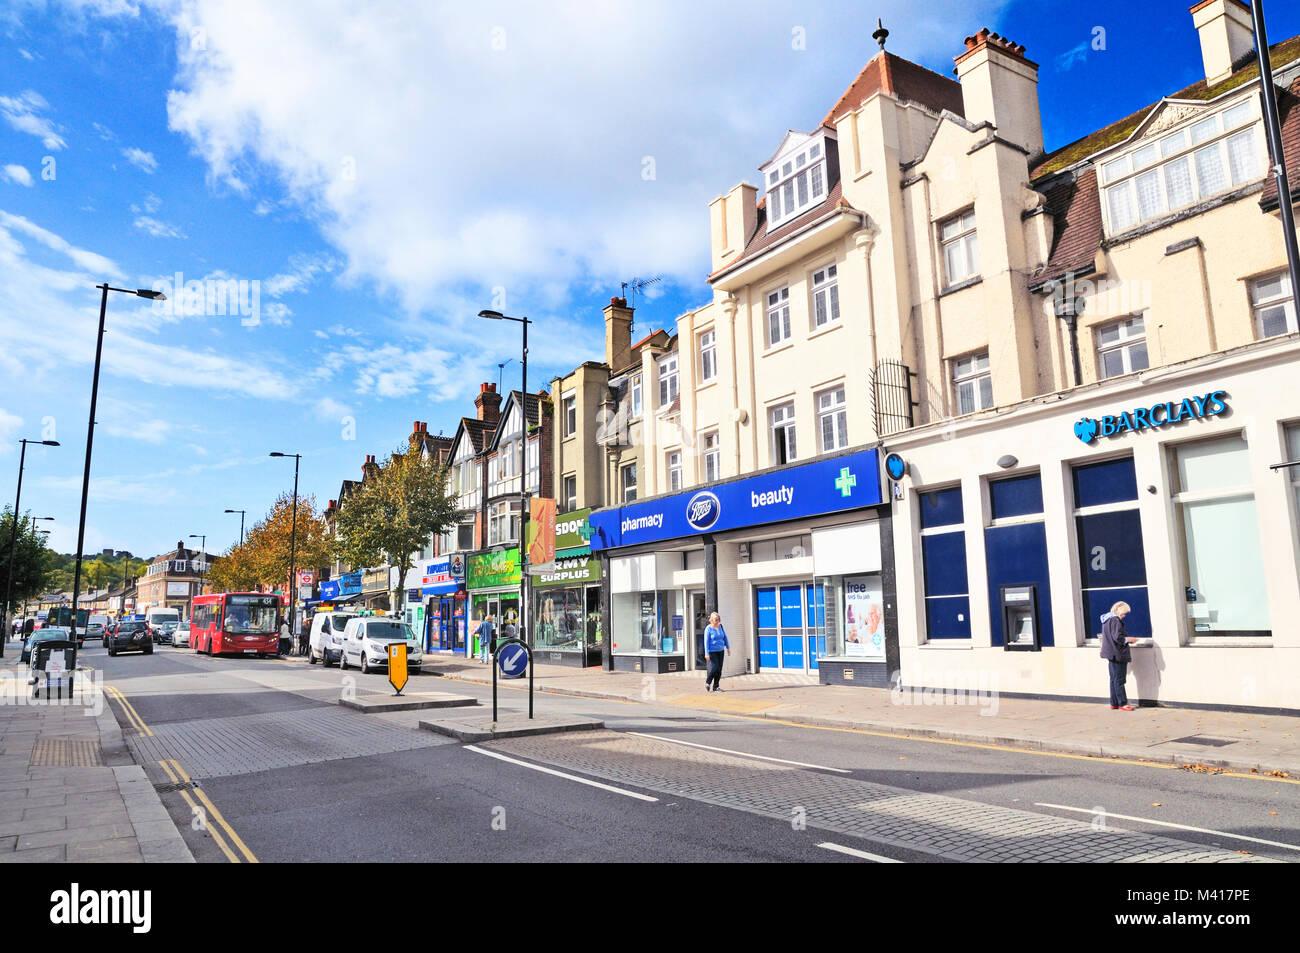 Coulsdon High Street, Surrey, London Borough of Croydon, Greater London, UK - Stock Image